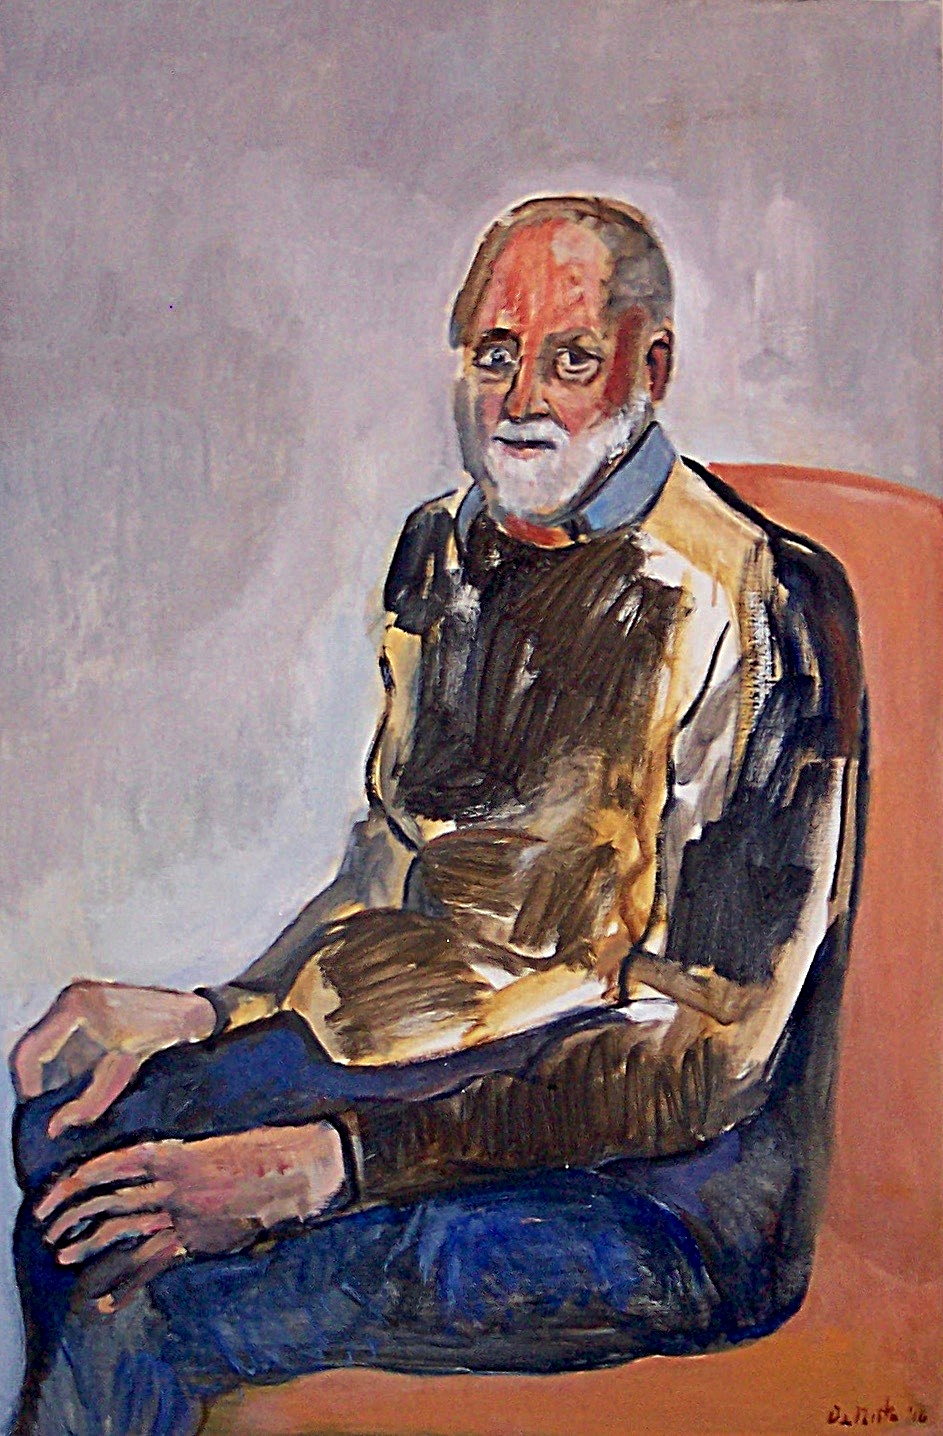 John Bierhorst